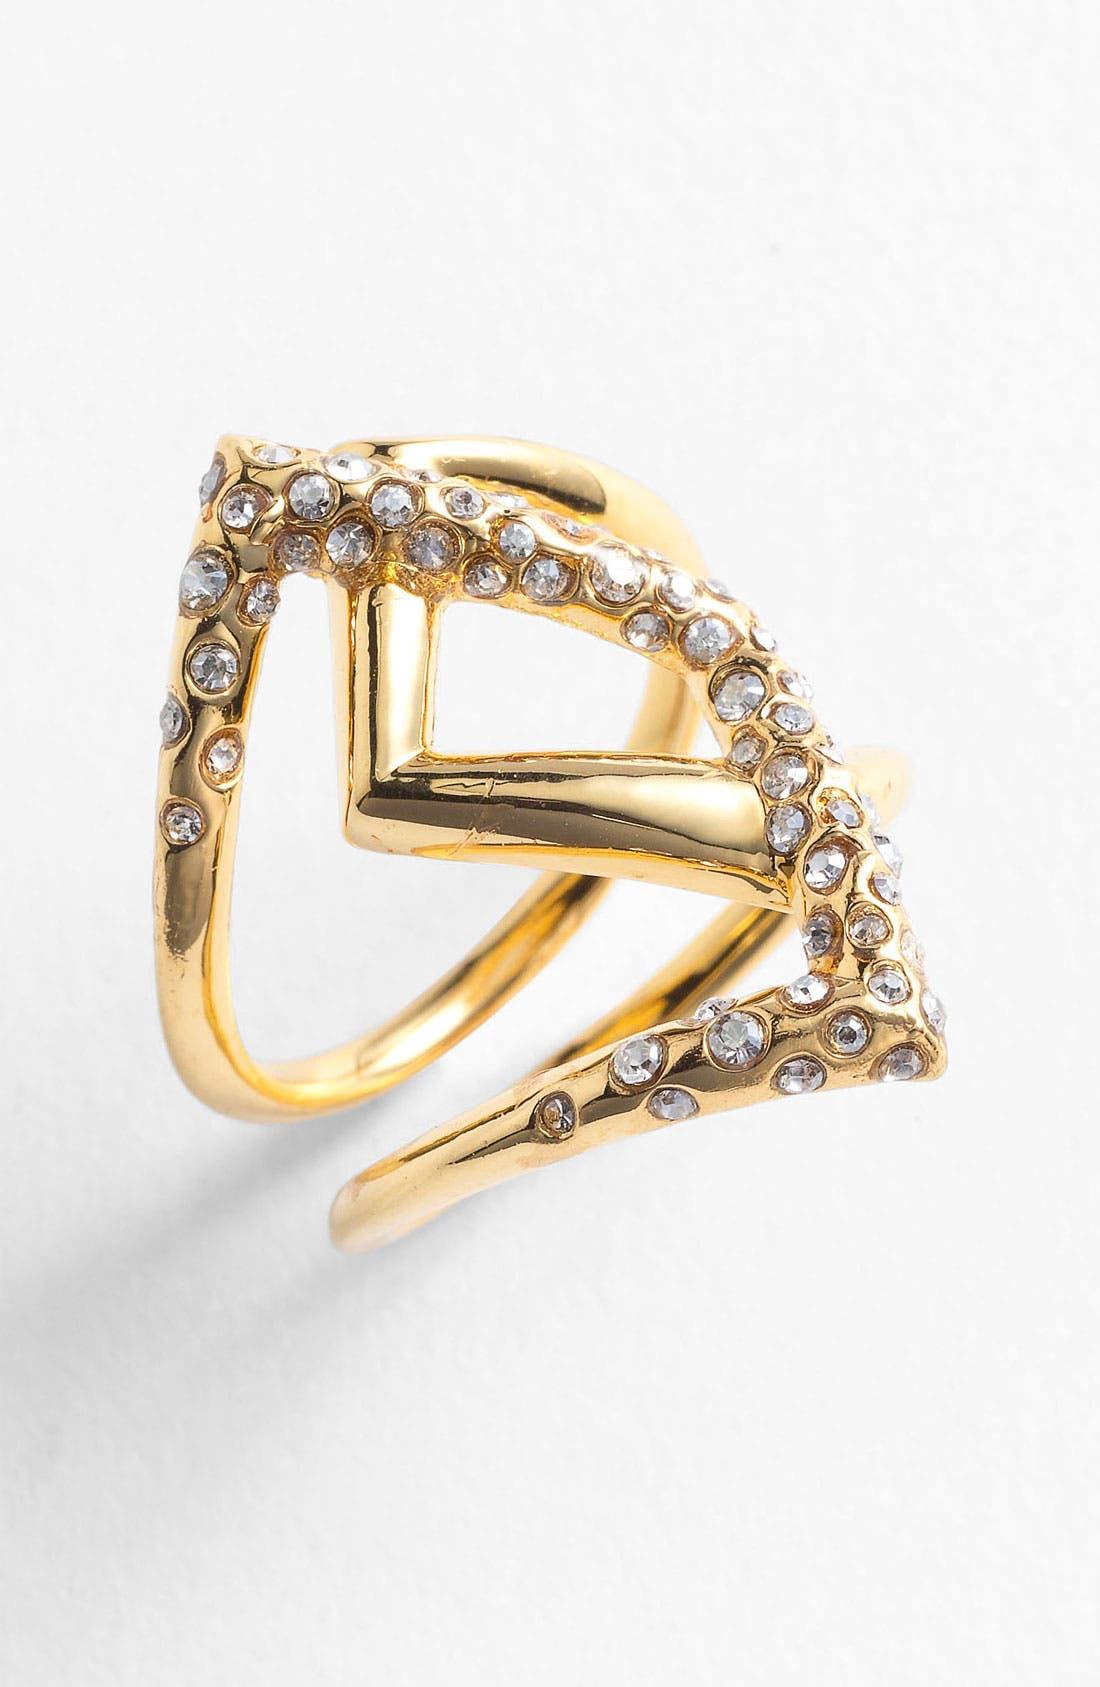 Alternate Image 1 Selected - Alexis Bittar 'Miss Havisham - New Wave' Overlap Ring